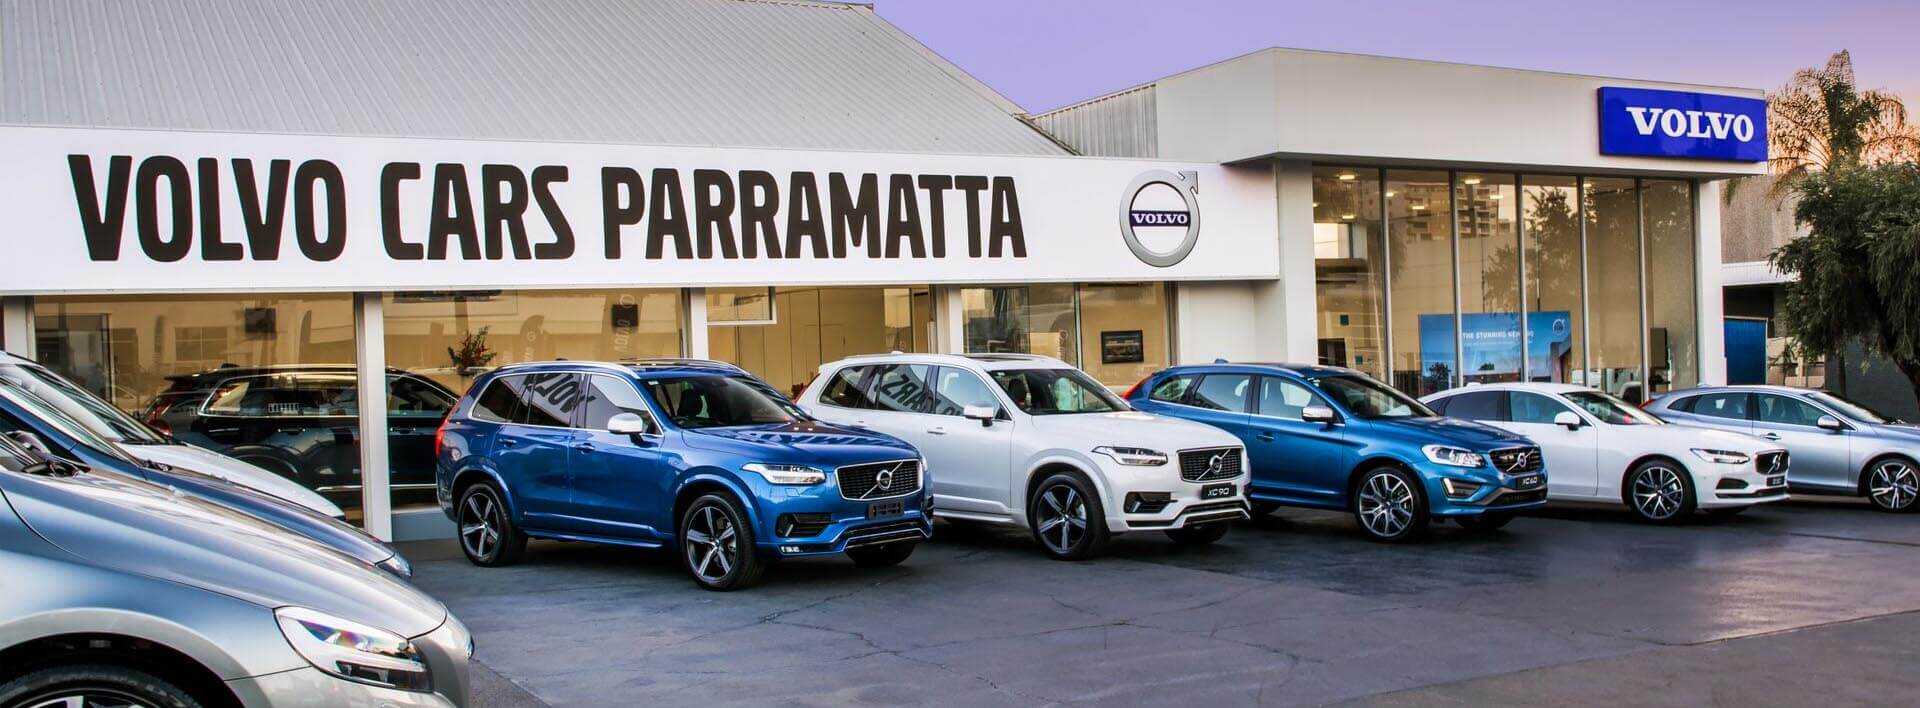 Volvo Cars Parramatta Sydney